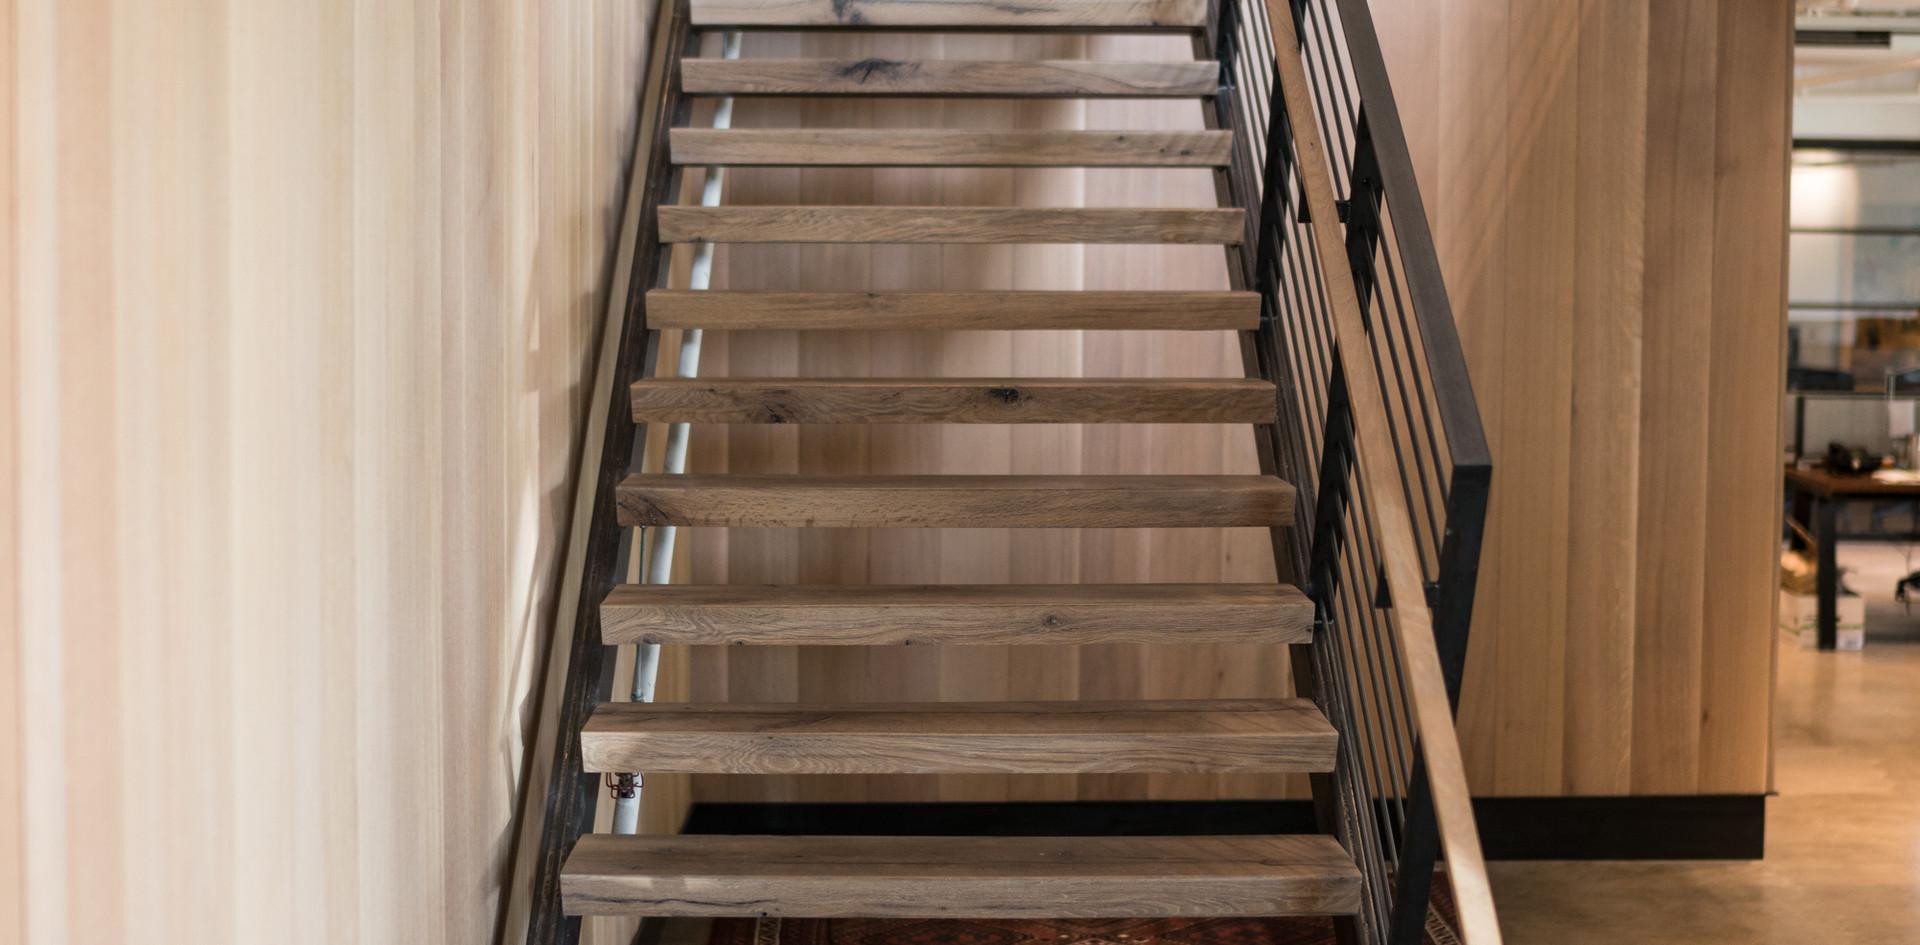 Texas Post Oak Hardwood Flooring Stairs